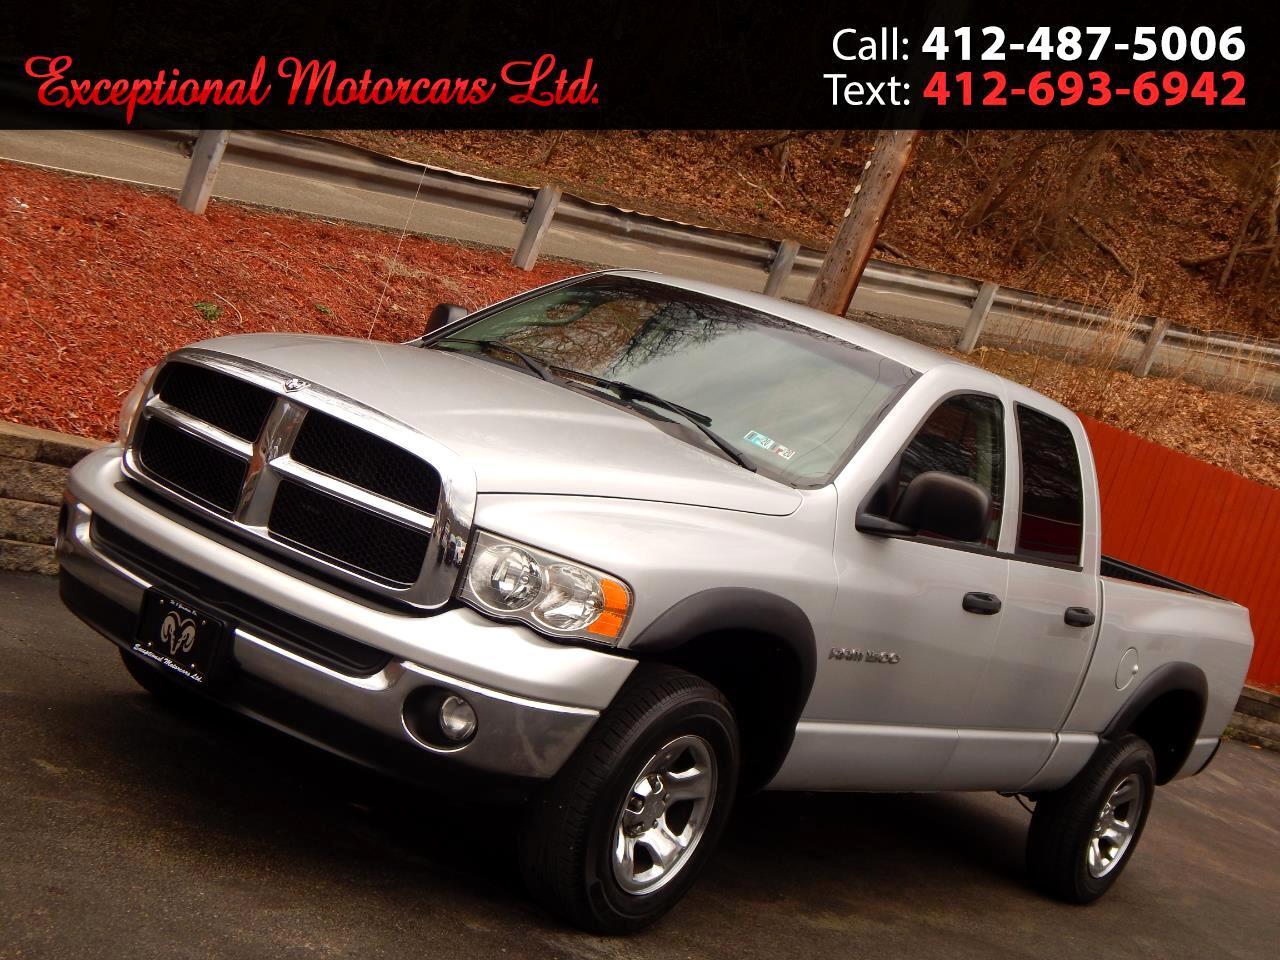 "2005 Dodge Ram 1500 4dr Quad Cab 140.5"" WB 4WD SLT"